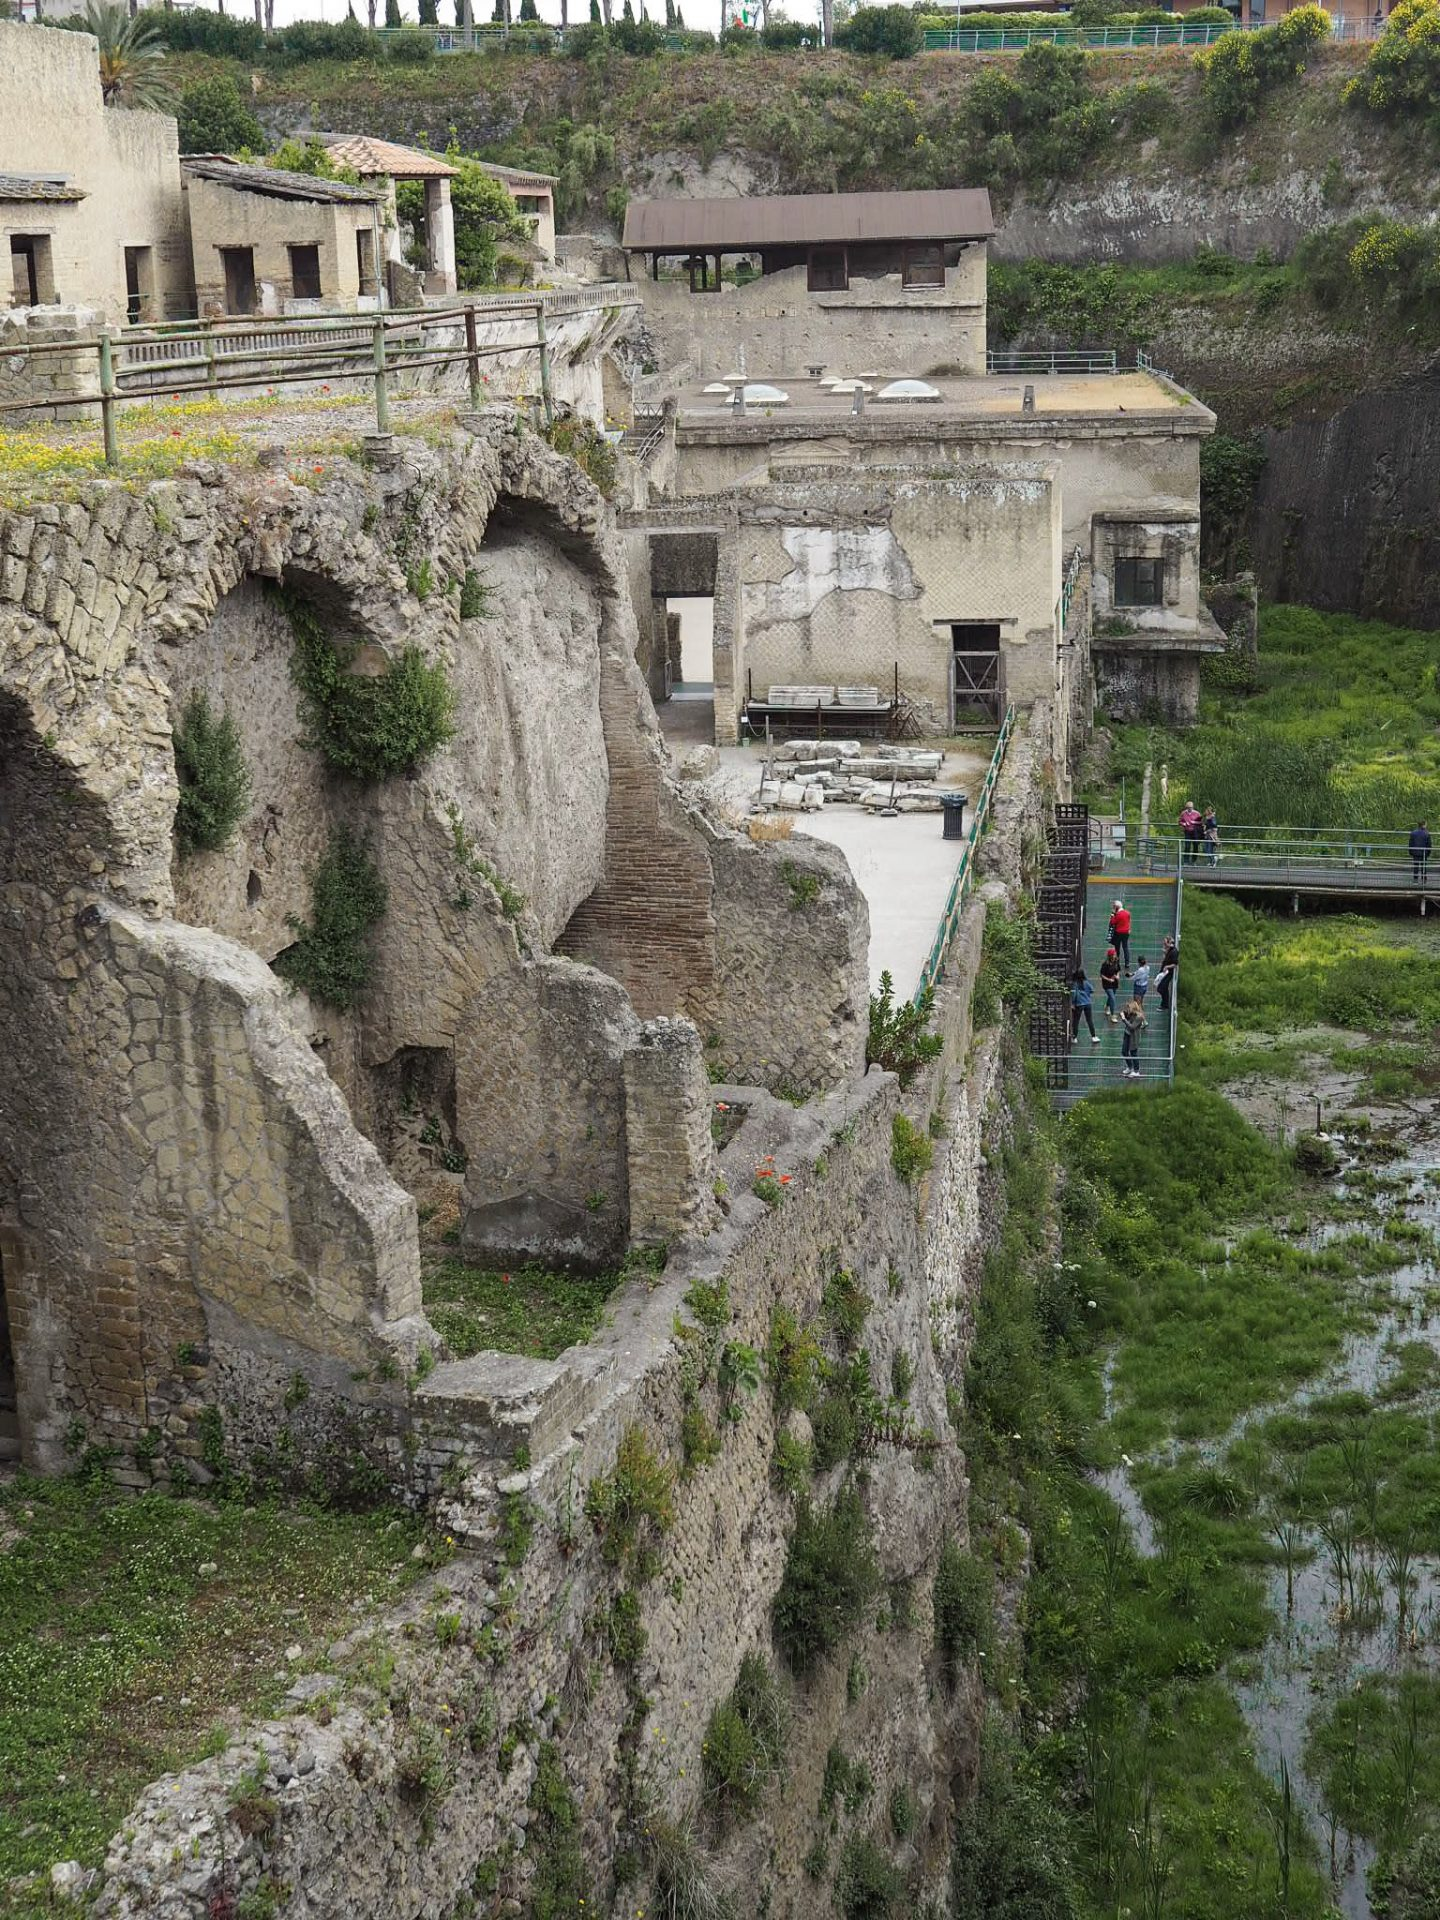 Sorrento travel - Ruins